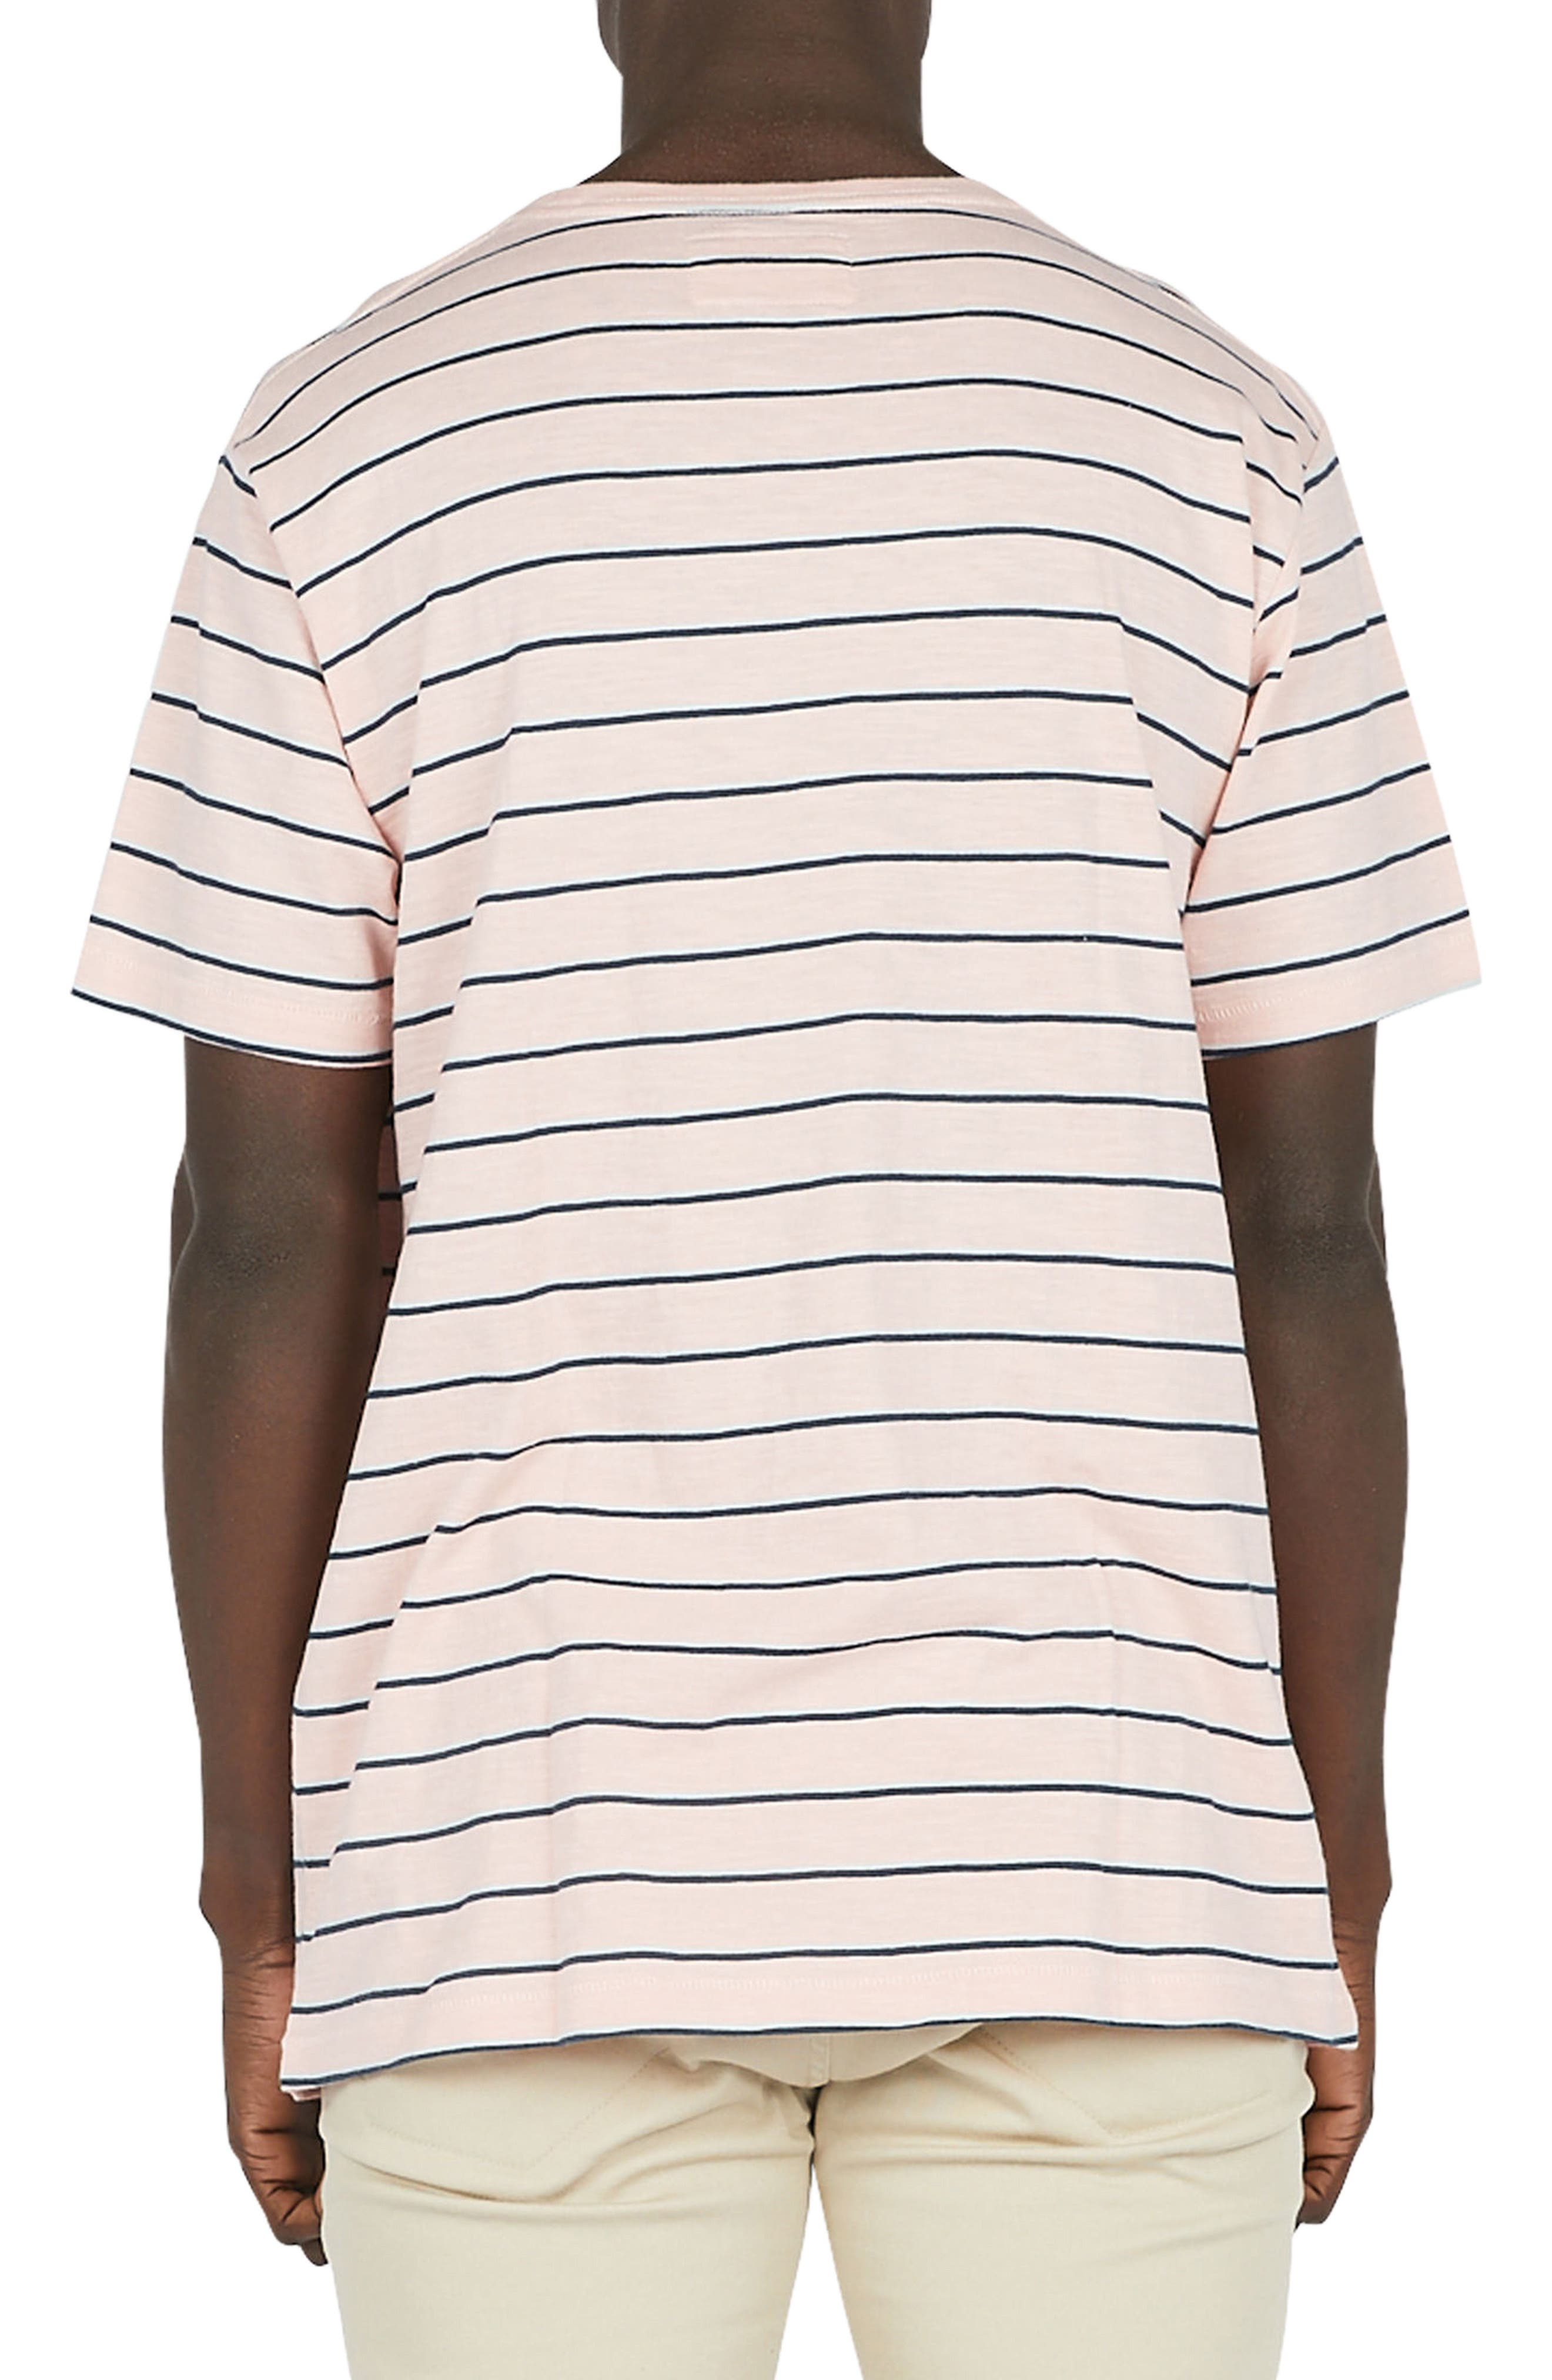 B.Schooled T-Shirt,                             Alternate thumbnail 2, color,                             682